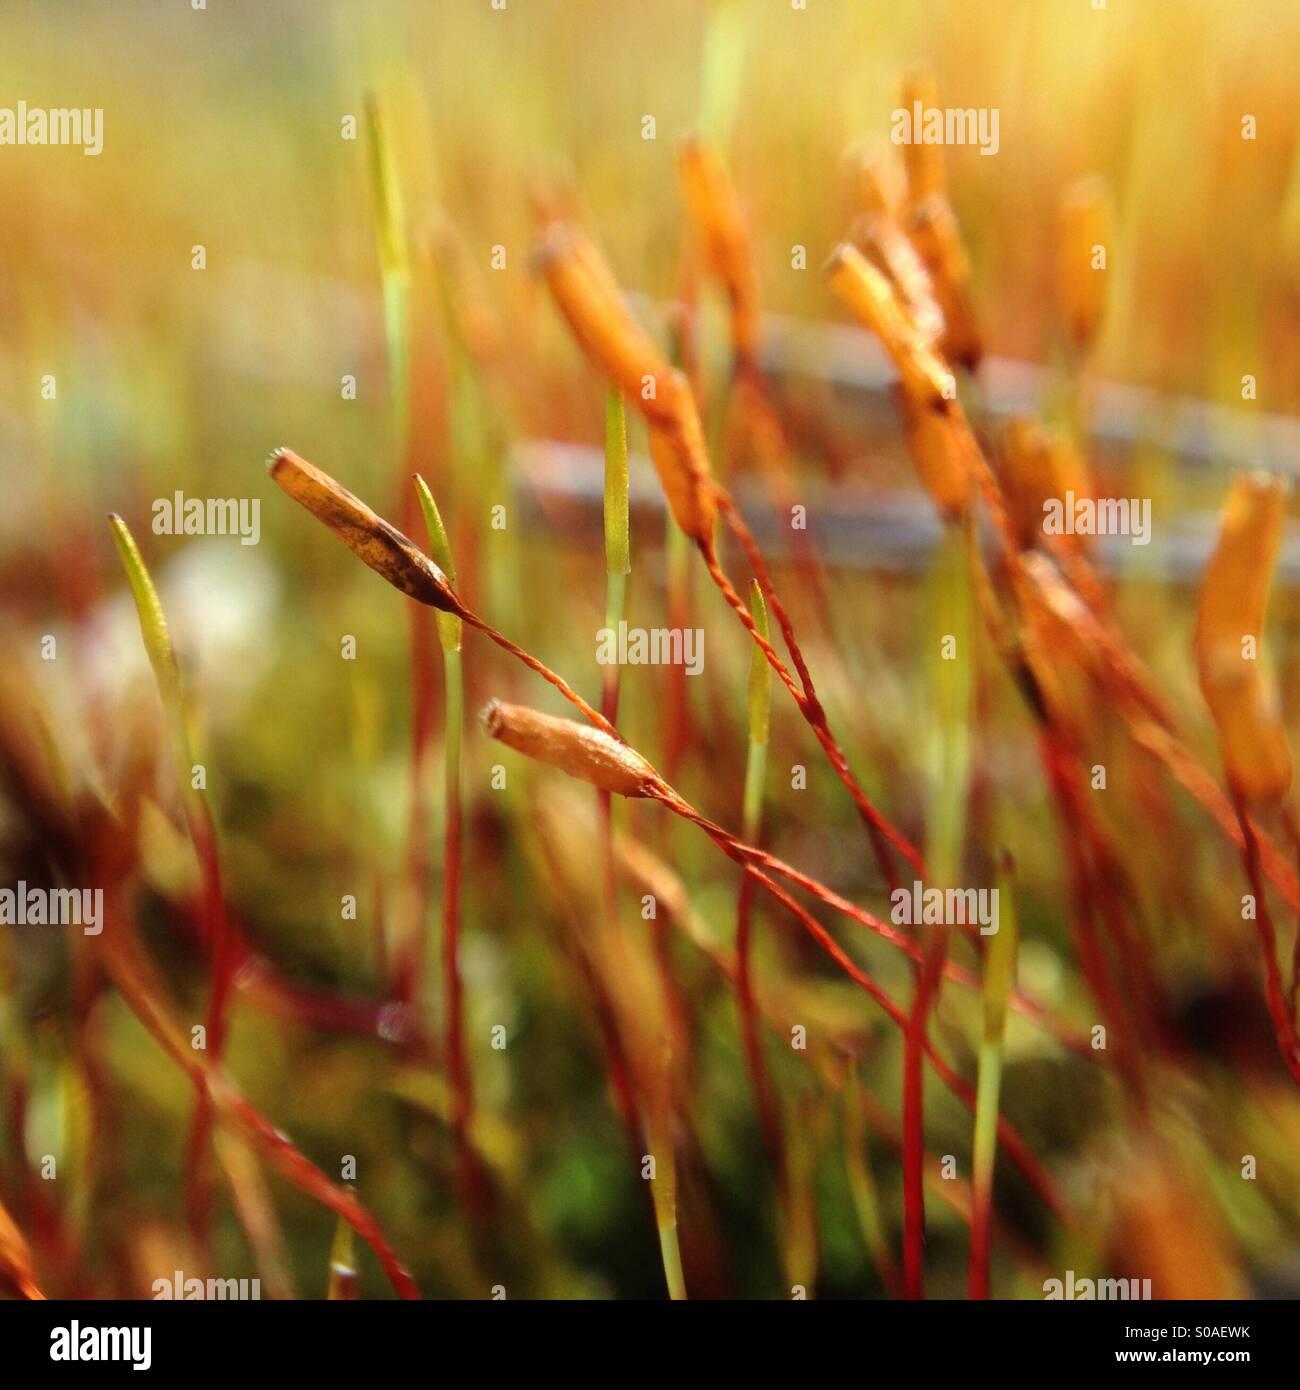 Gemeinsame Moossporen Stockfotos & Moossporen Bilder - Alamy &IS_52